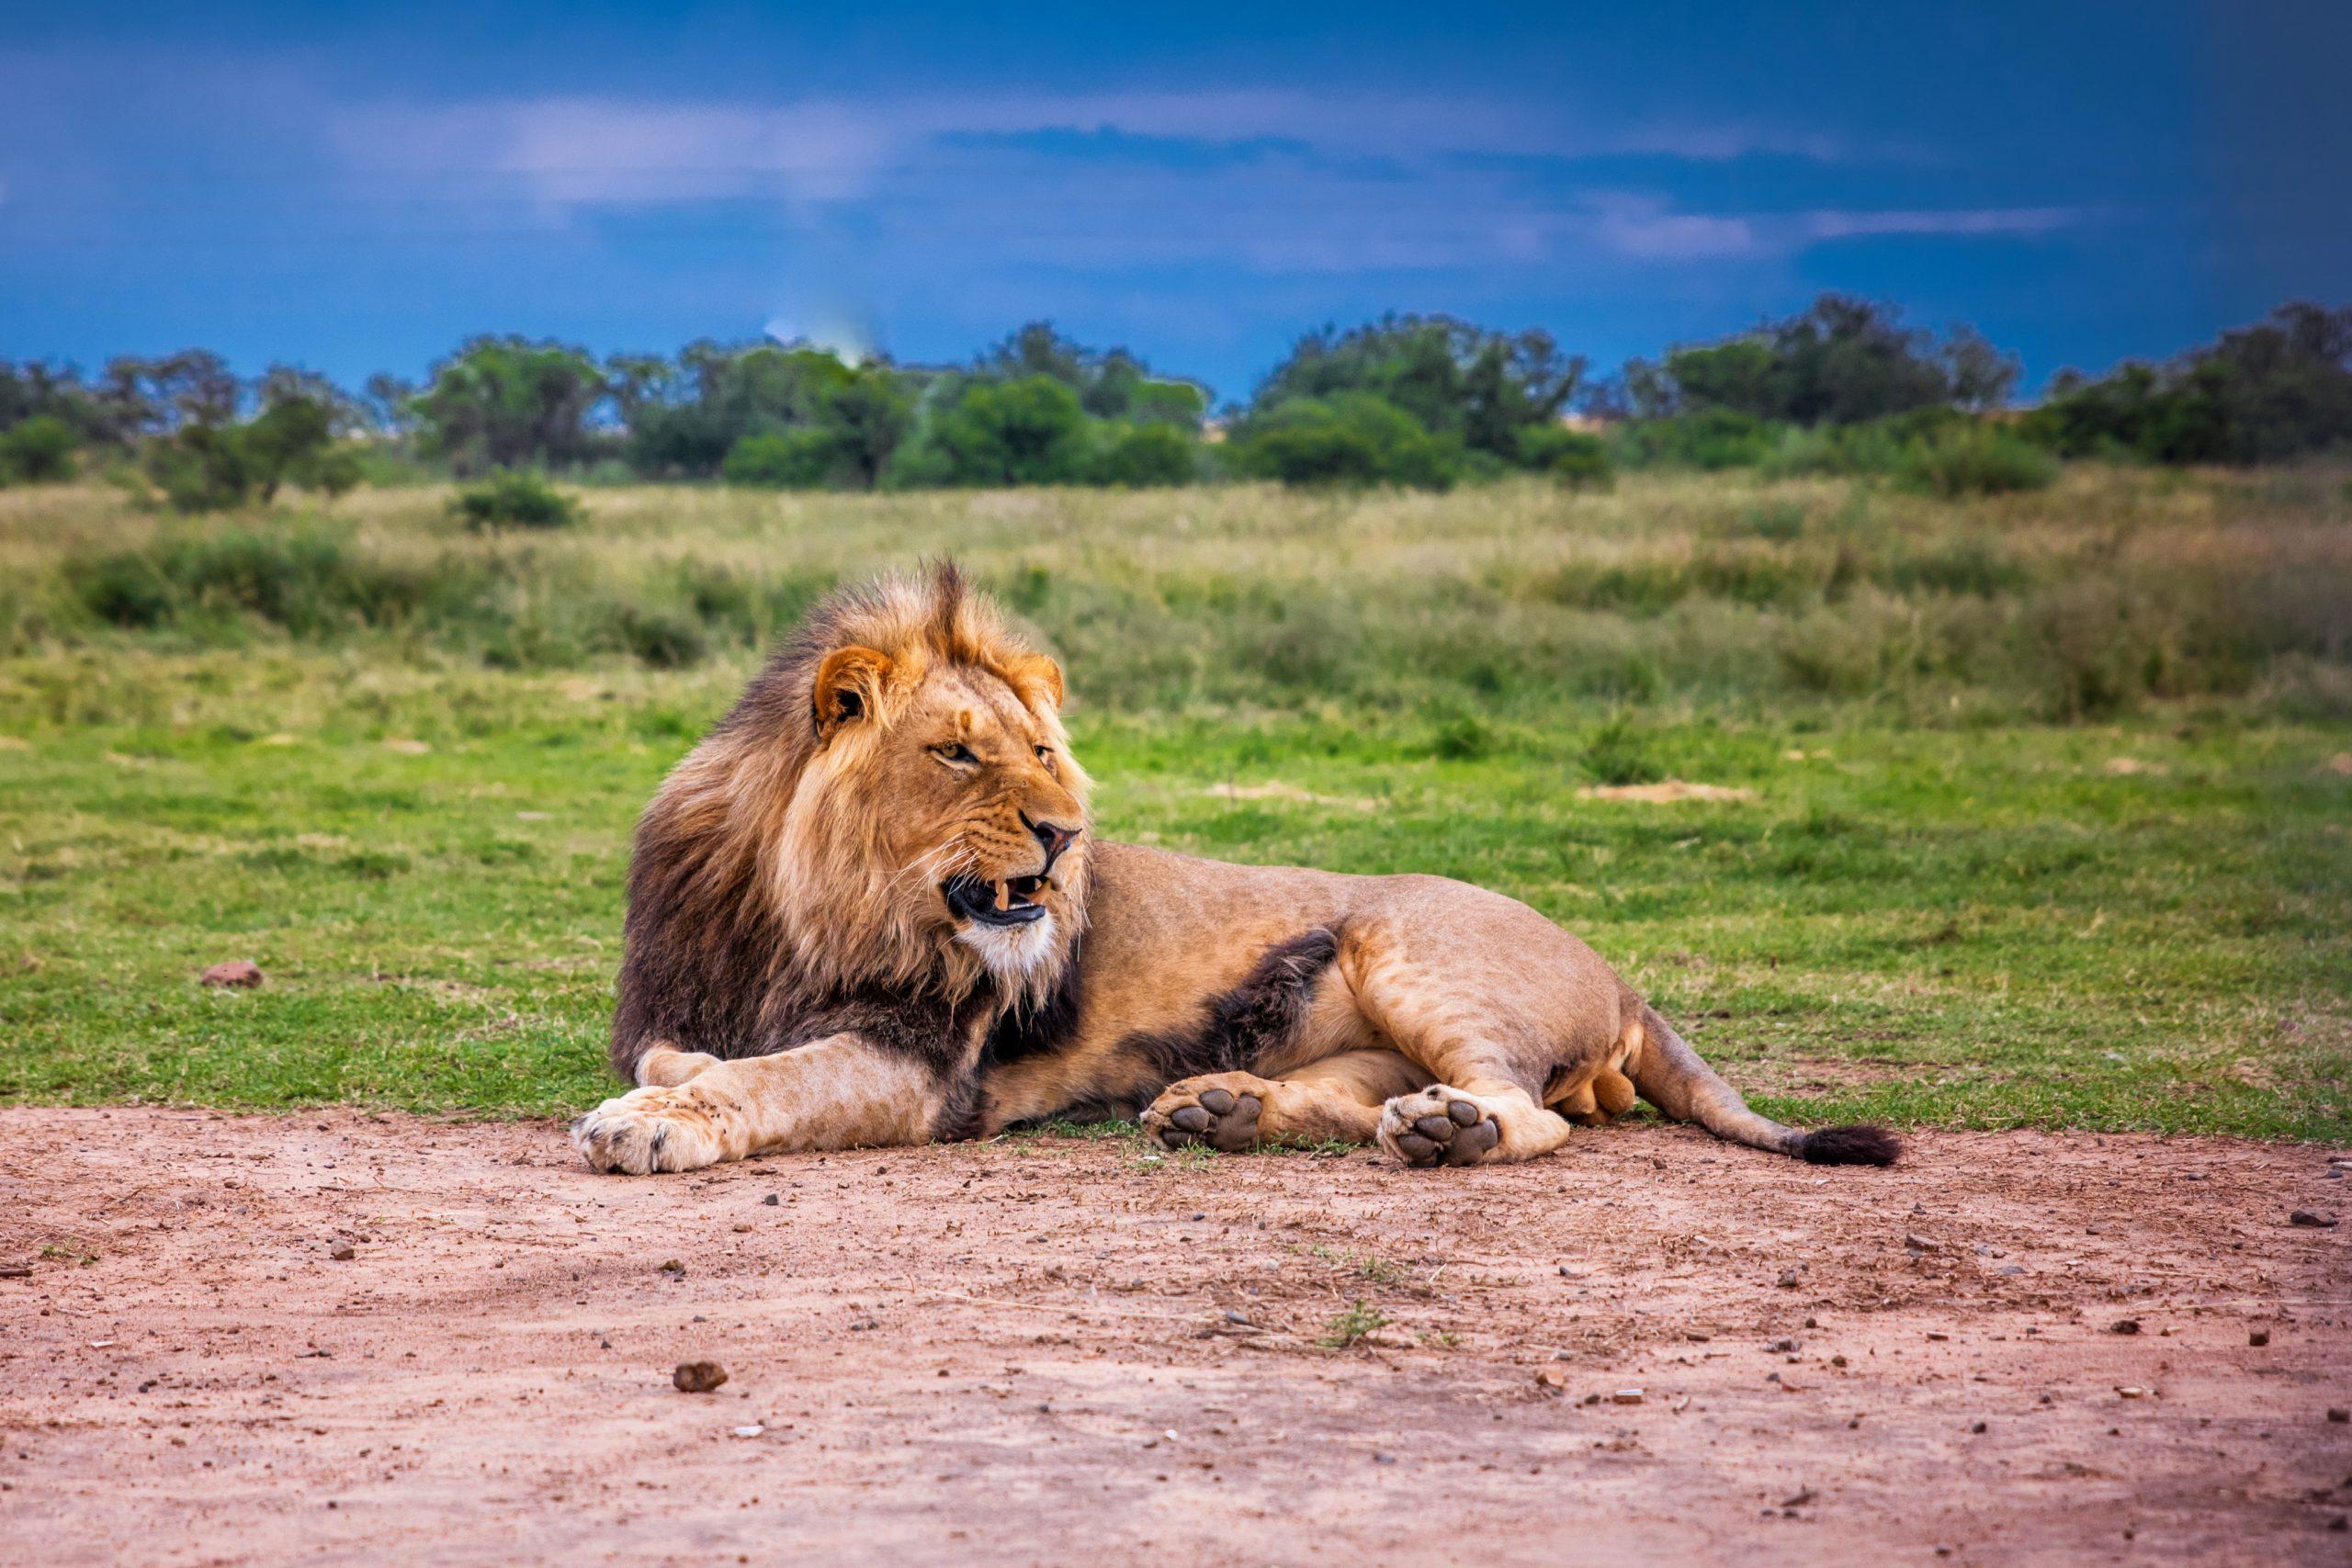 Kom helt tæt på savannens store kattedyr